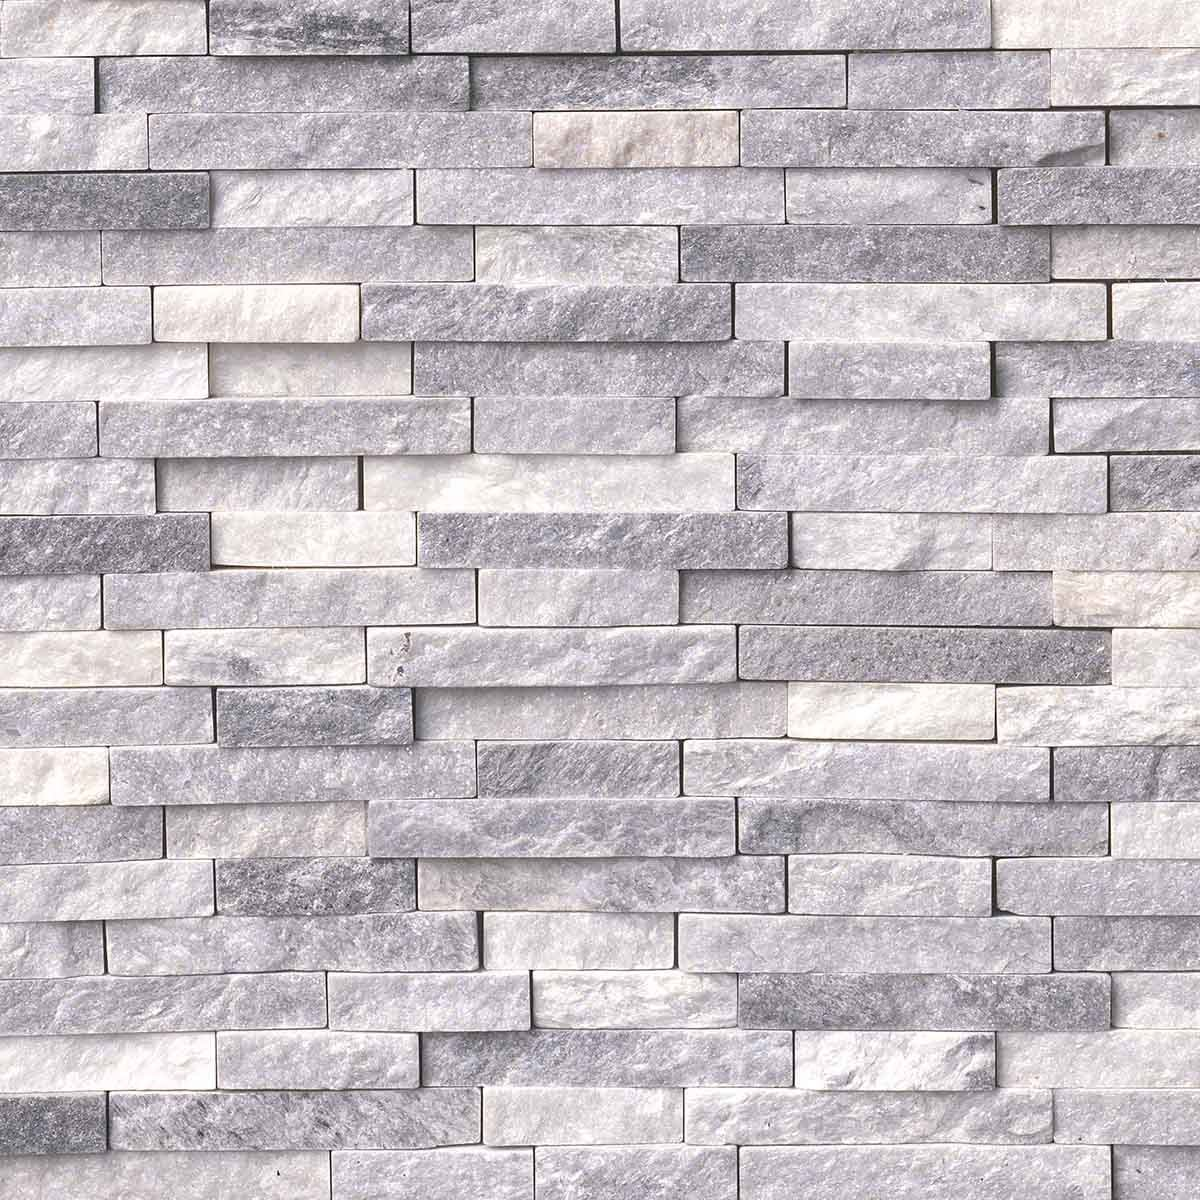 Alaskan Gray Splitface Interlocking Pattern Marble Mosaic Tile